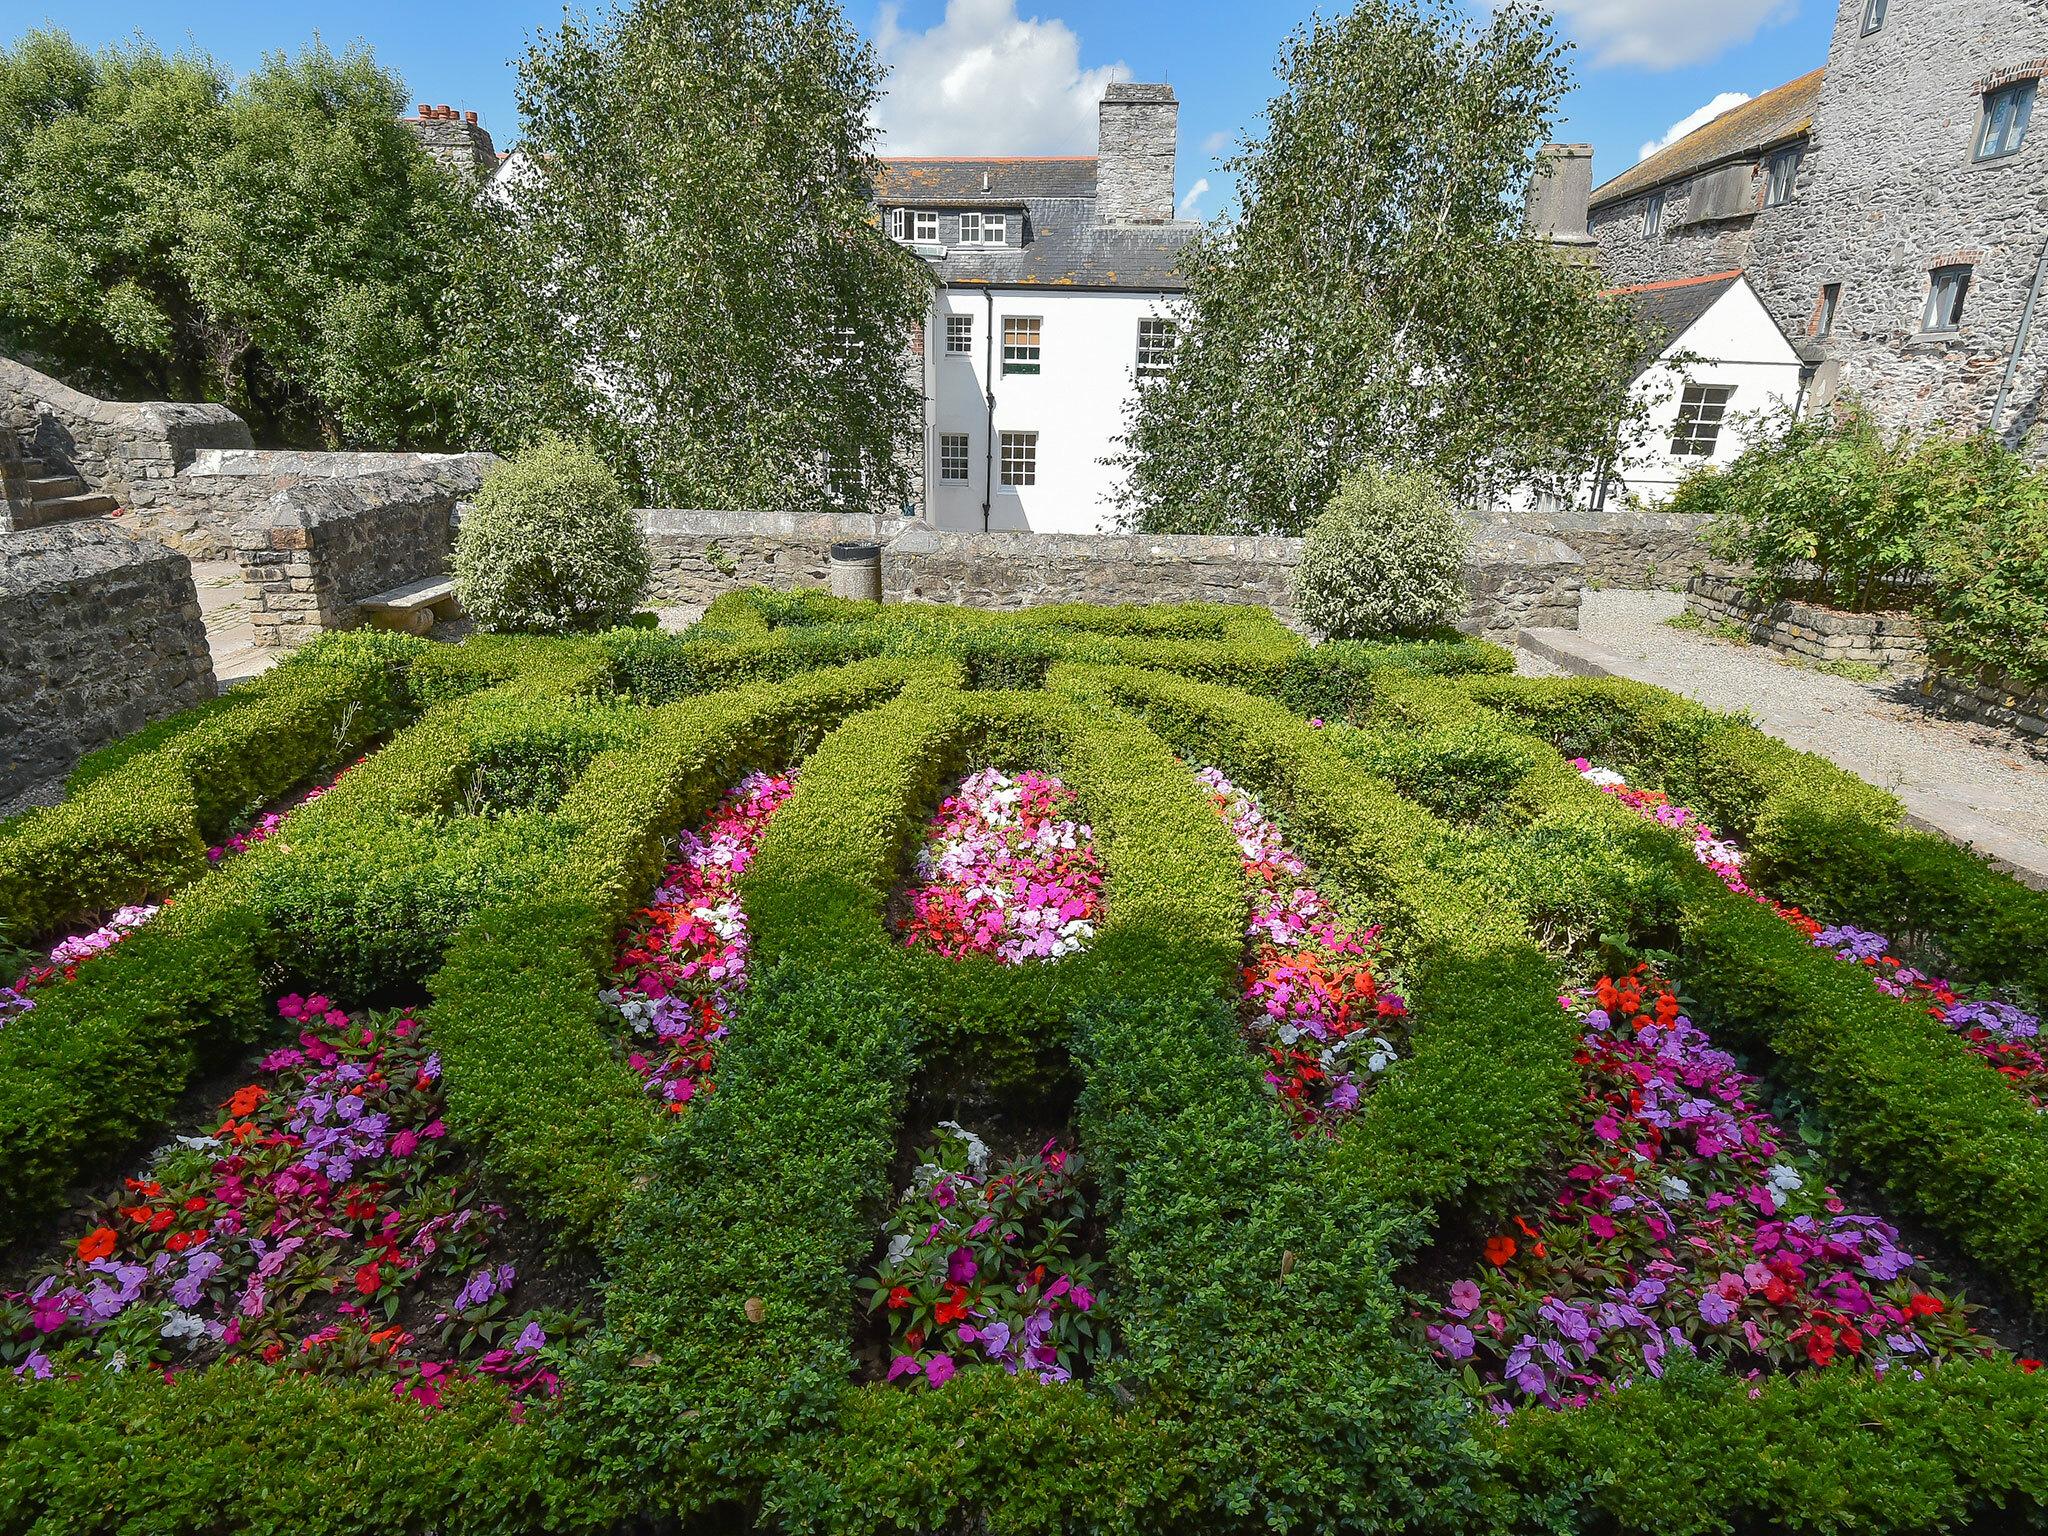 The Elizabethan Gardens